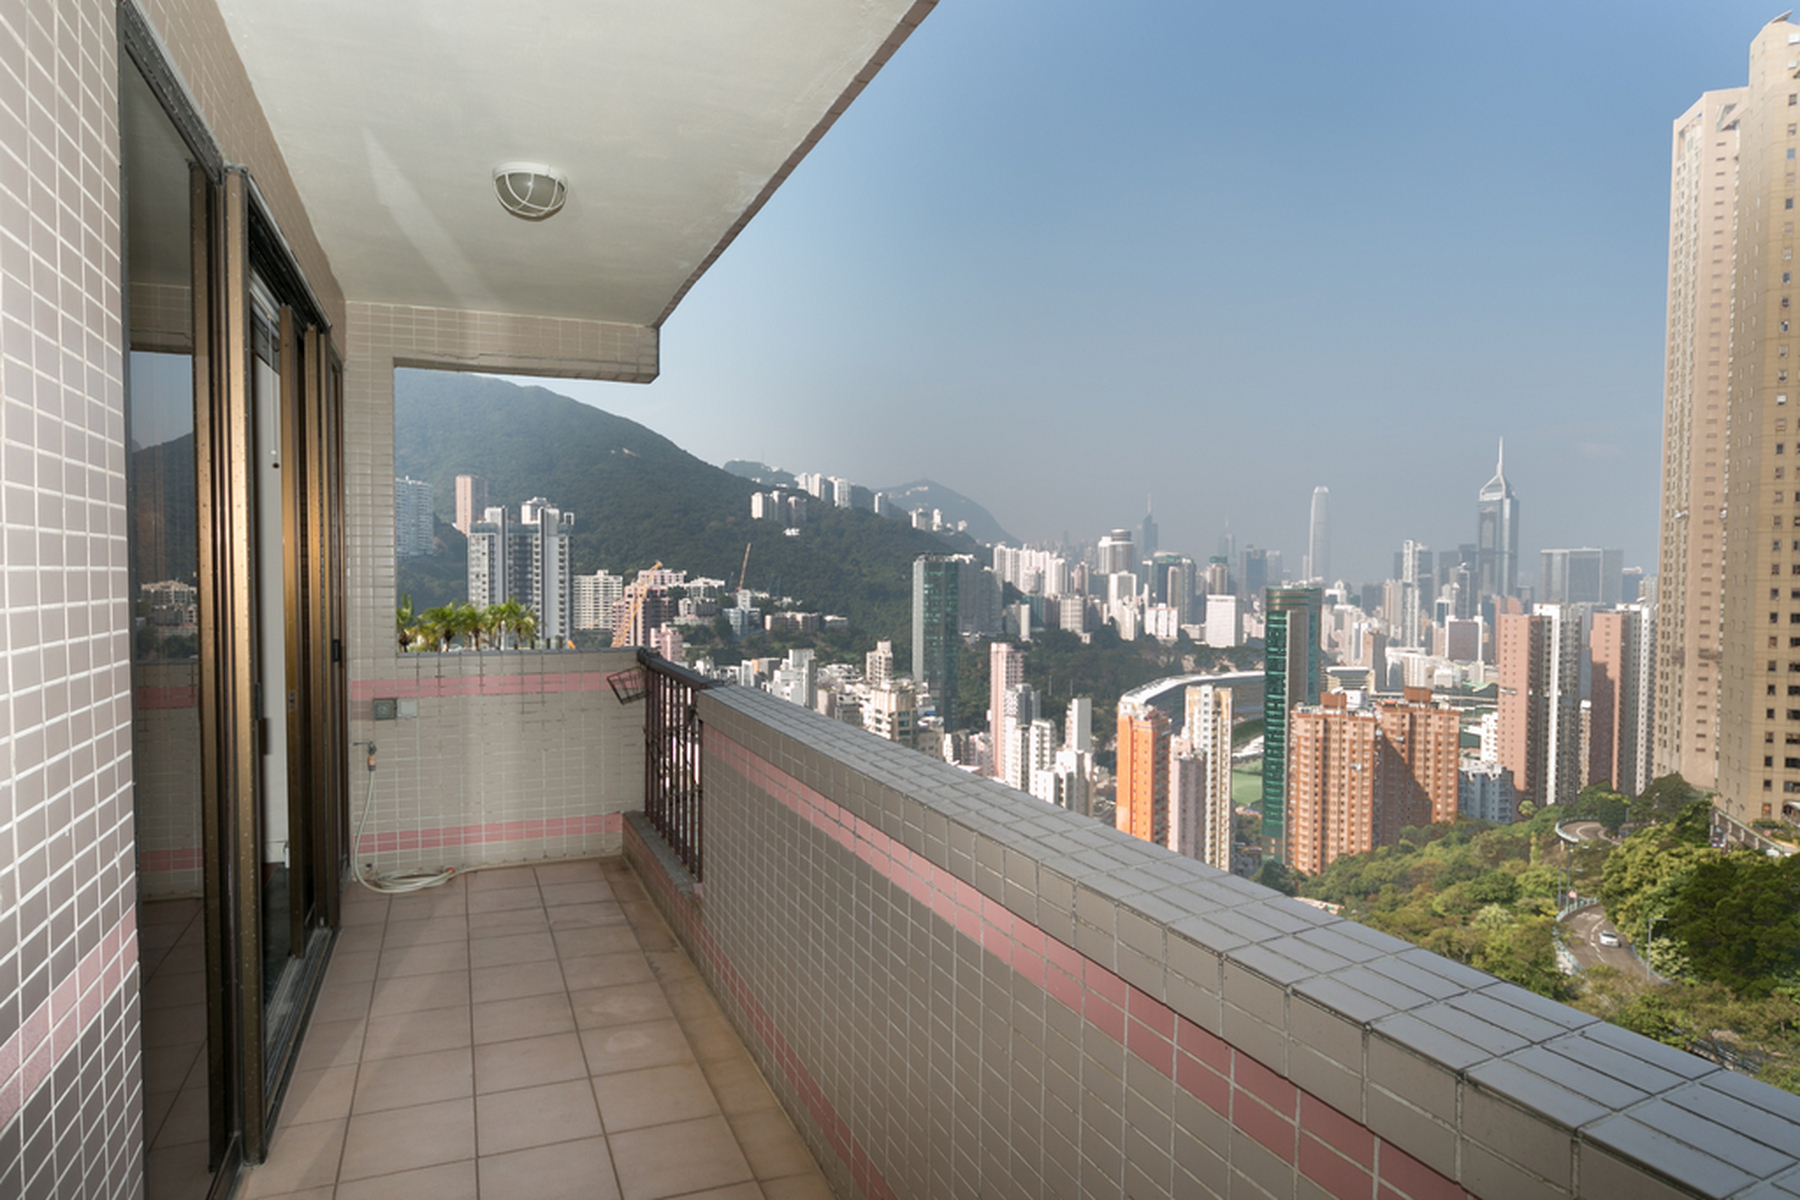 154, Tai Hang Road